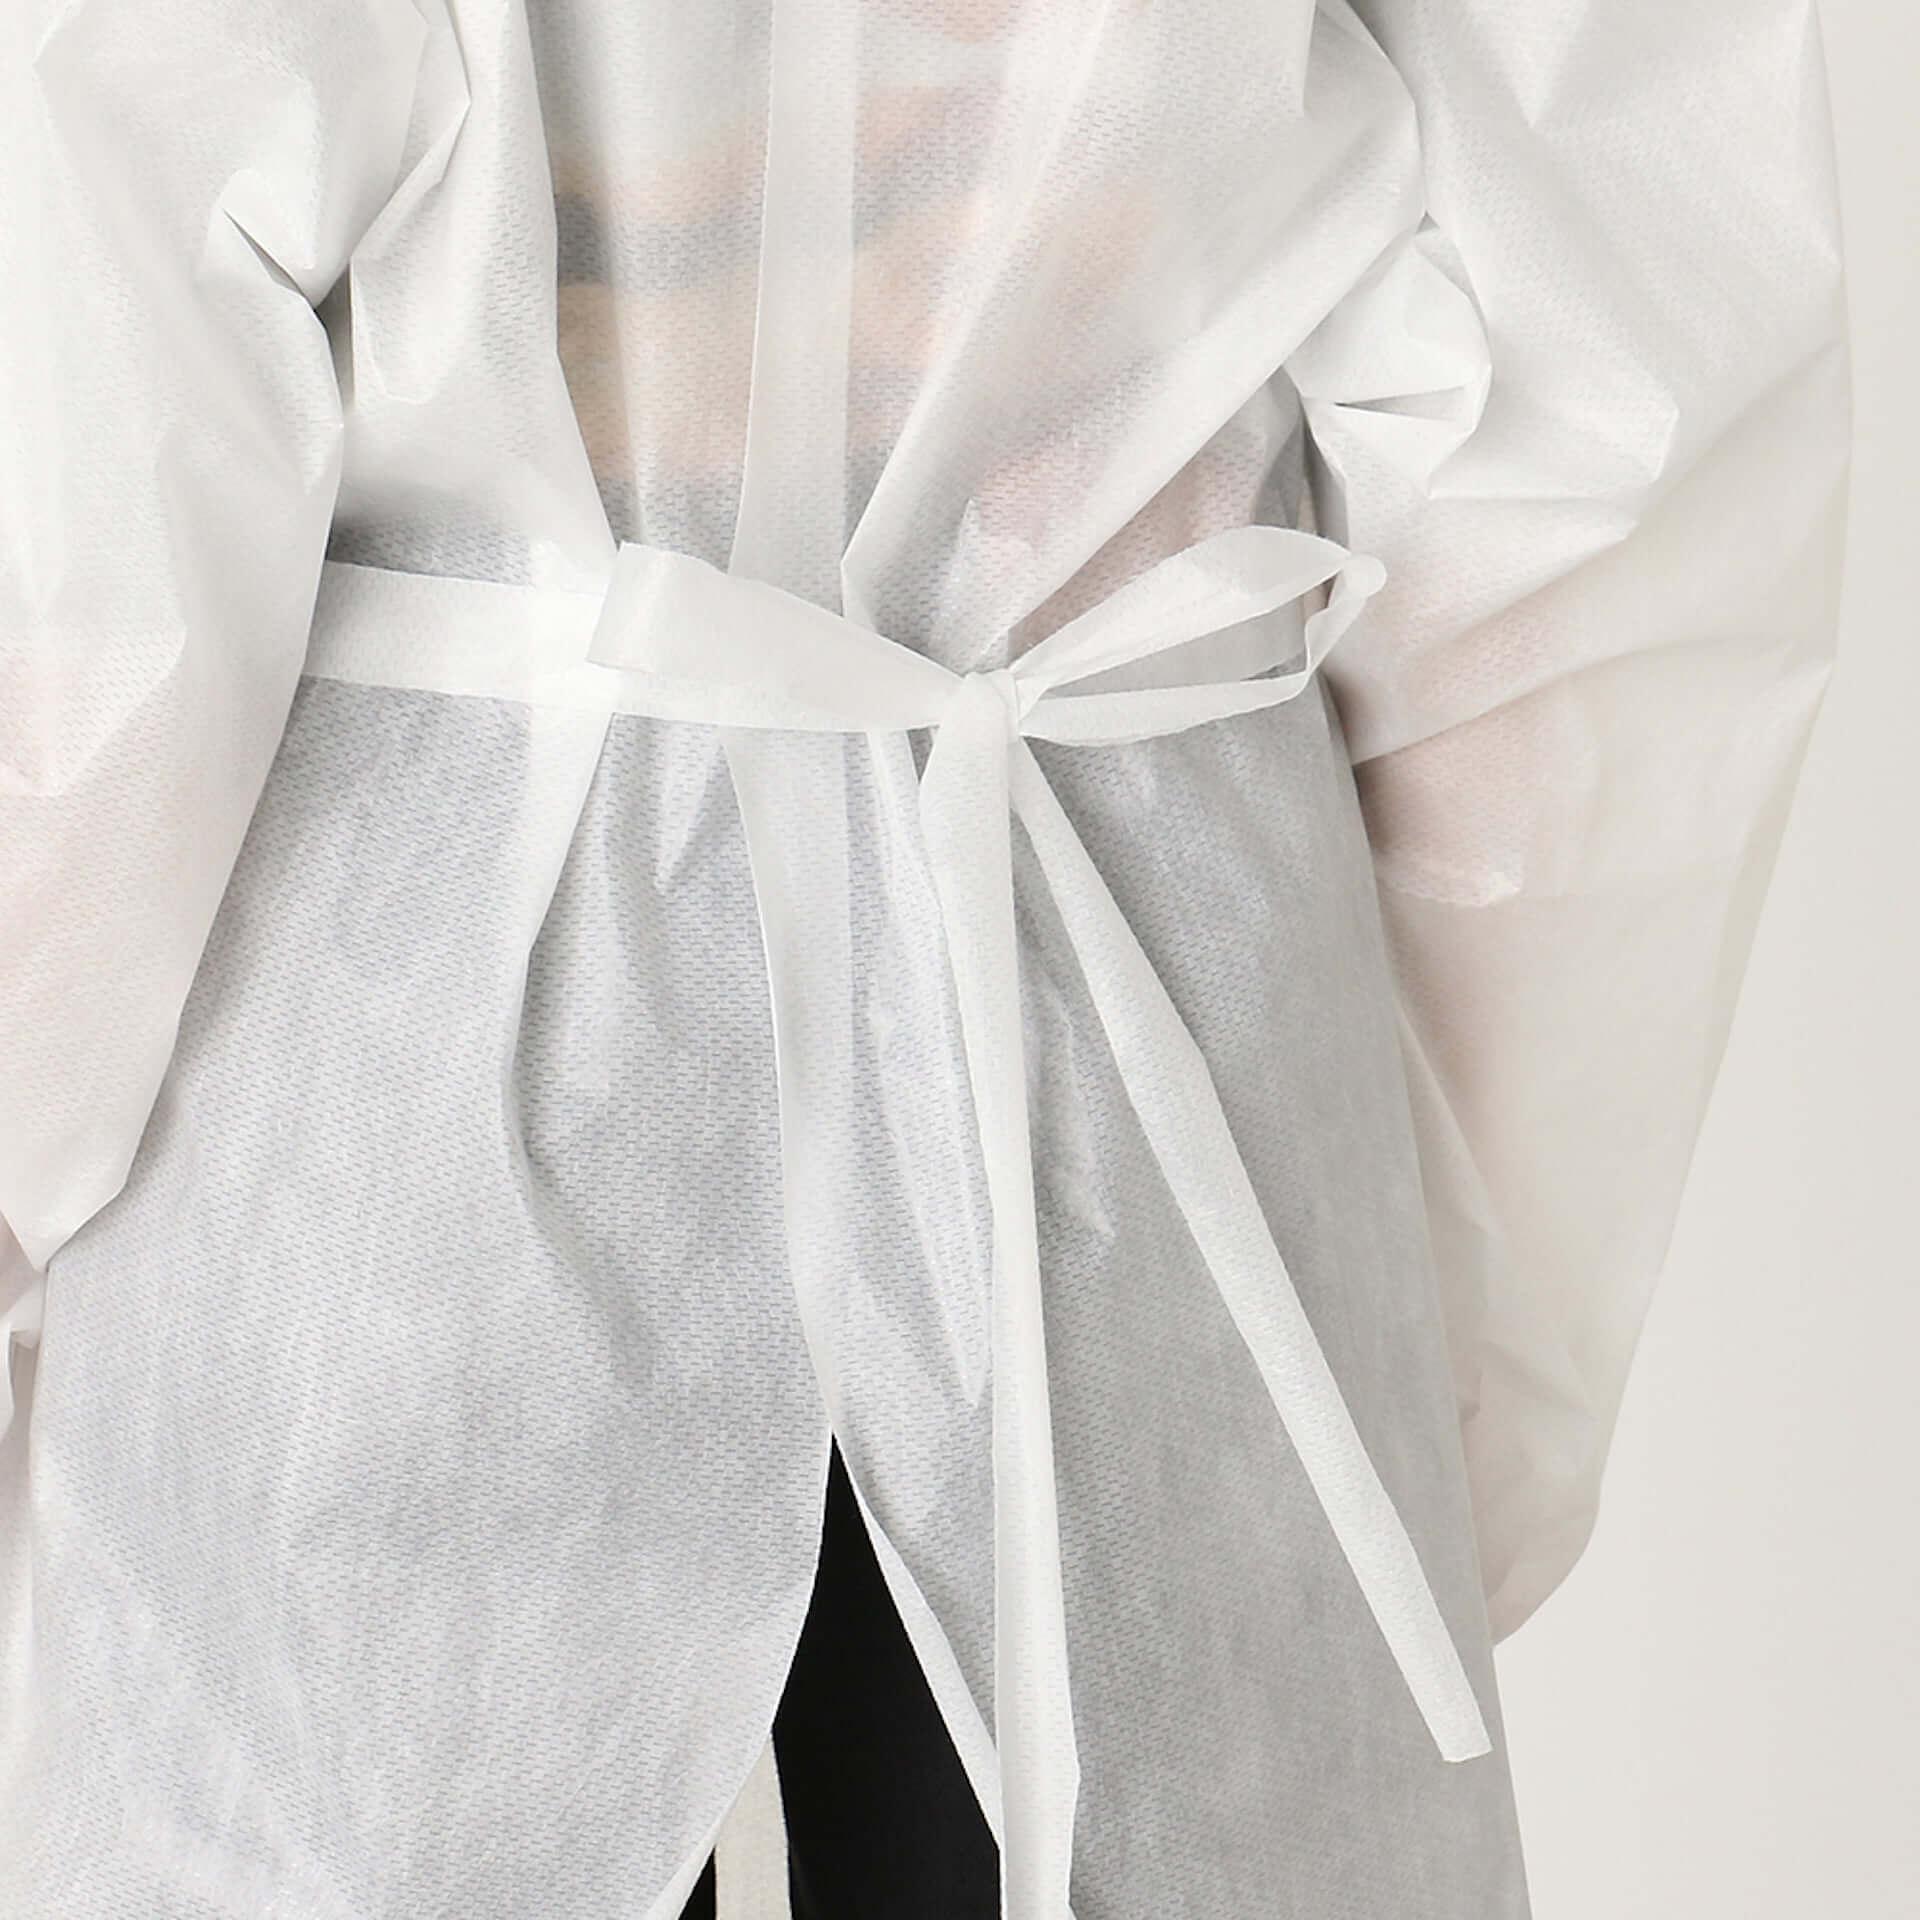 EDWINがアイソレーションガウンを自社縫製工場にて生産開始&オンライン販売もスタート! lf200722_edwin_3-1920x1920